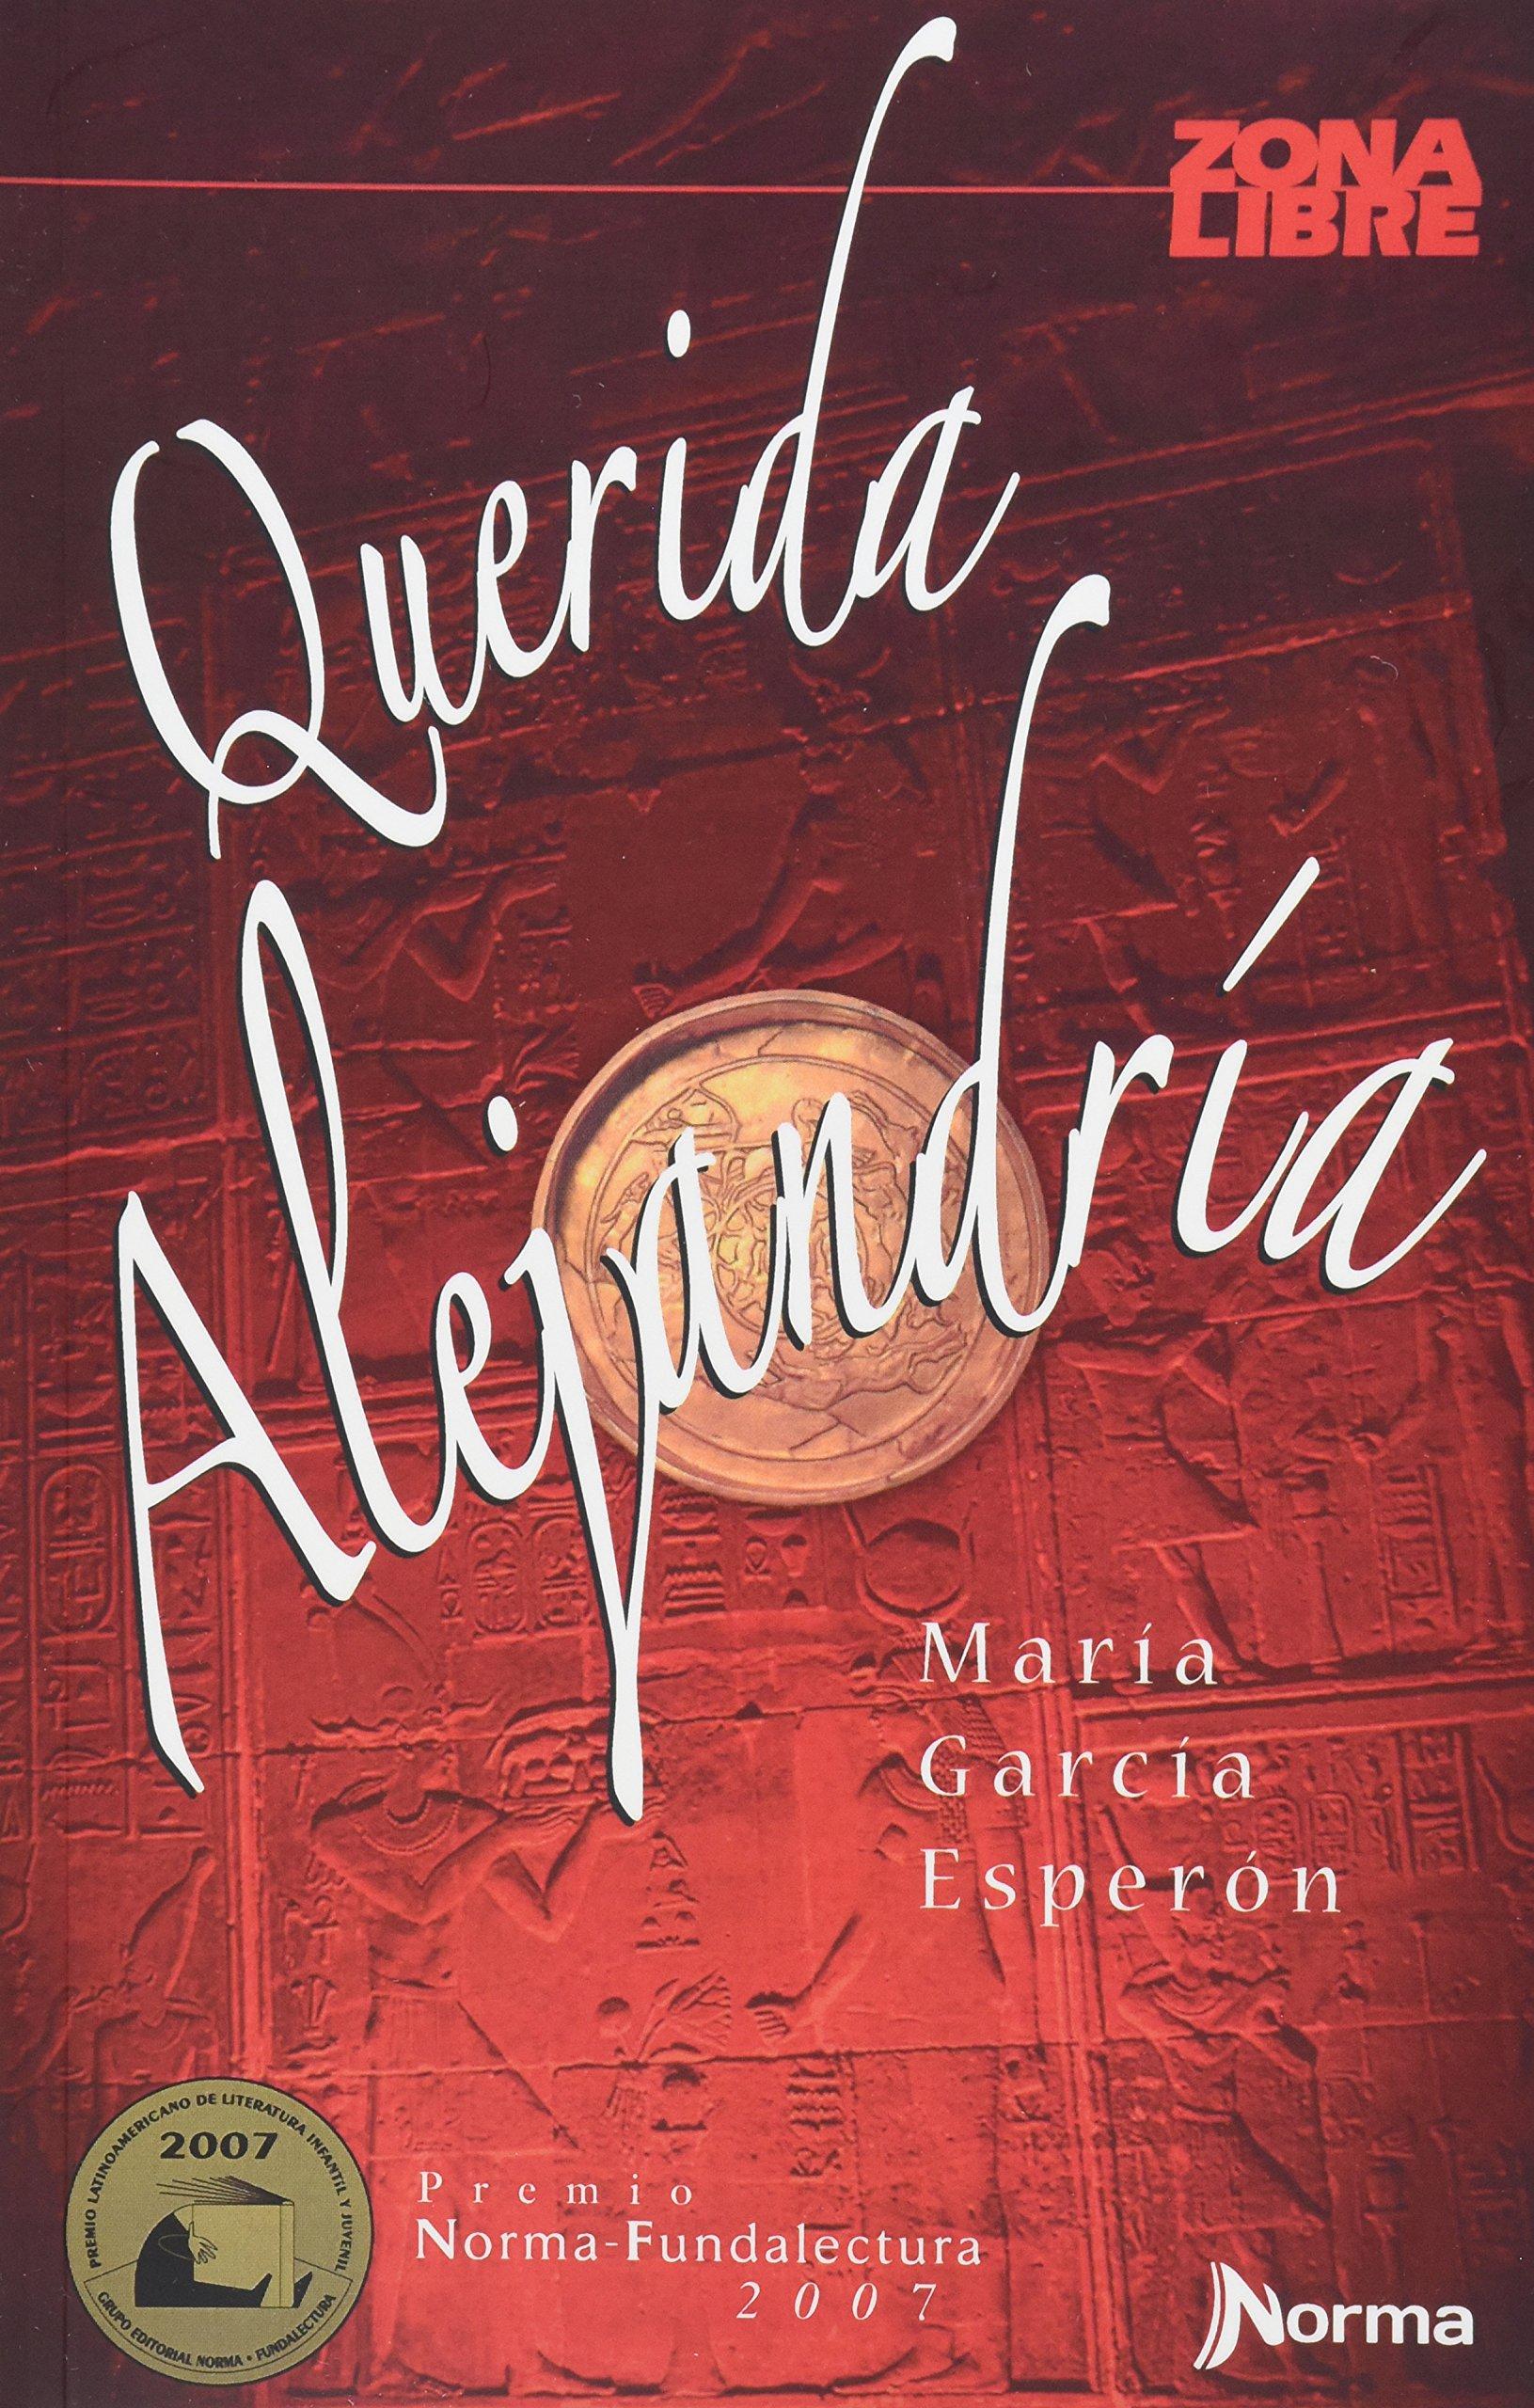 Querida Alejandria: MARIA GARCIA ESPERON: 9789580498452: Amazon.com: Books